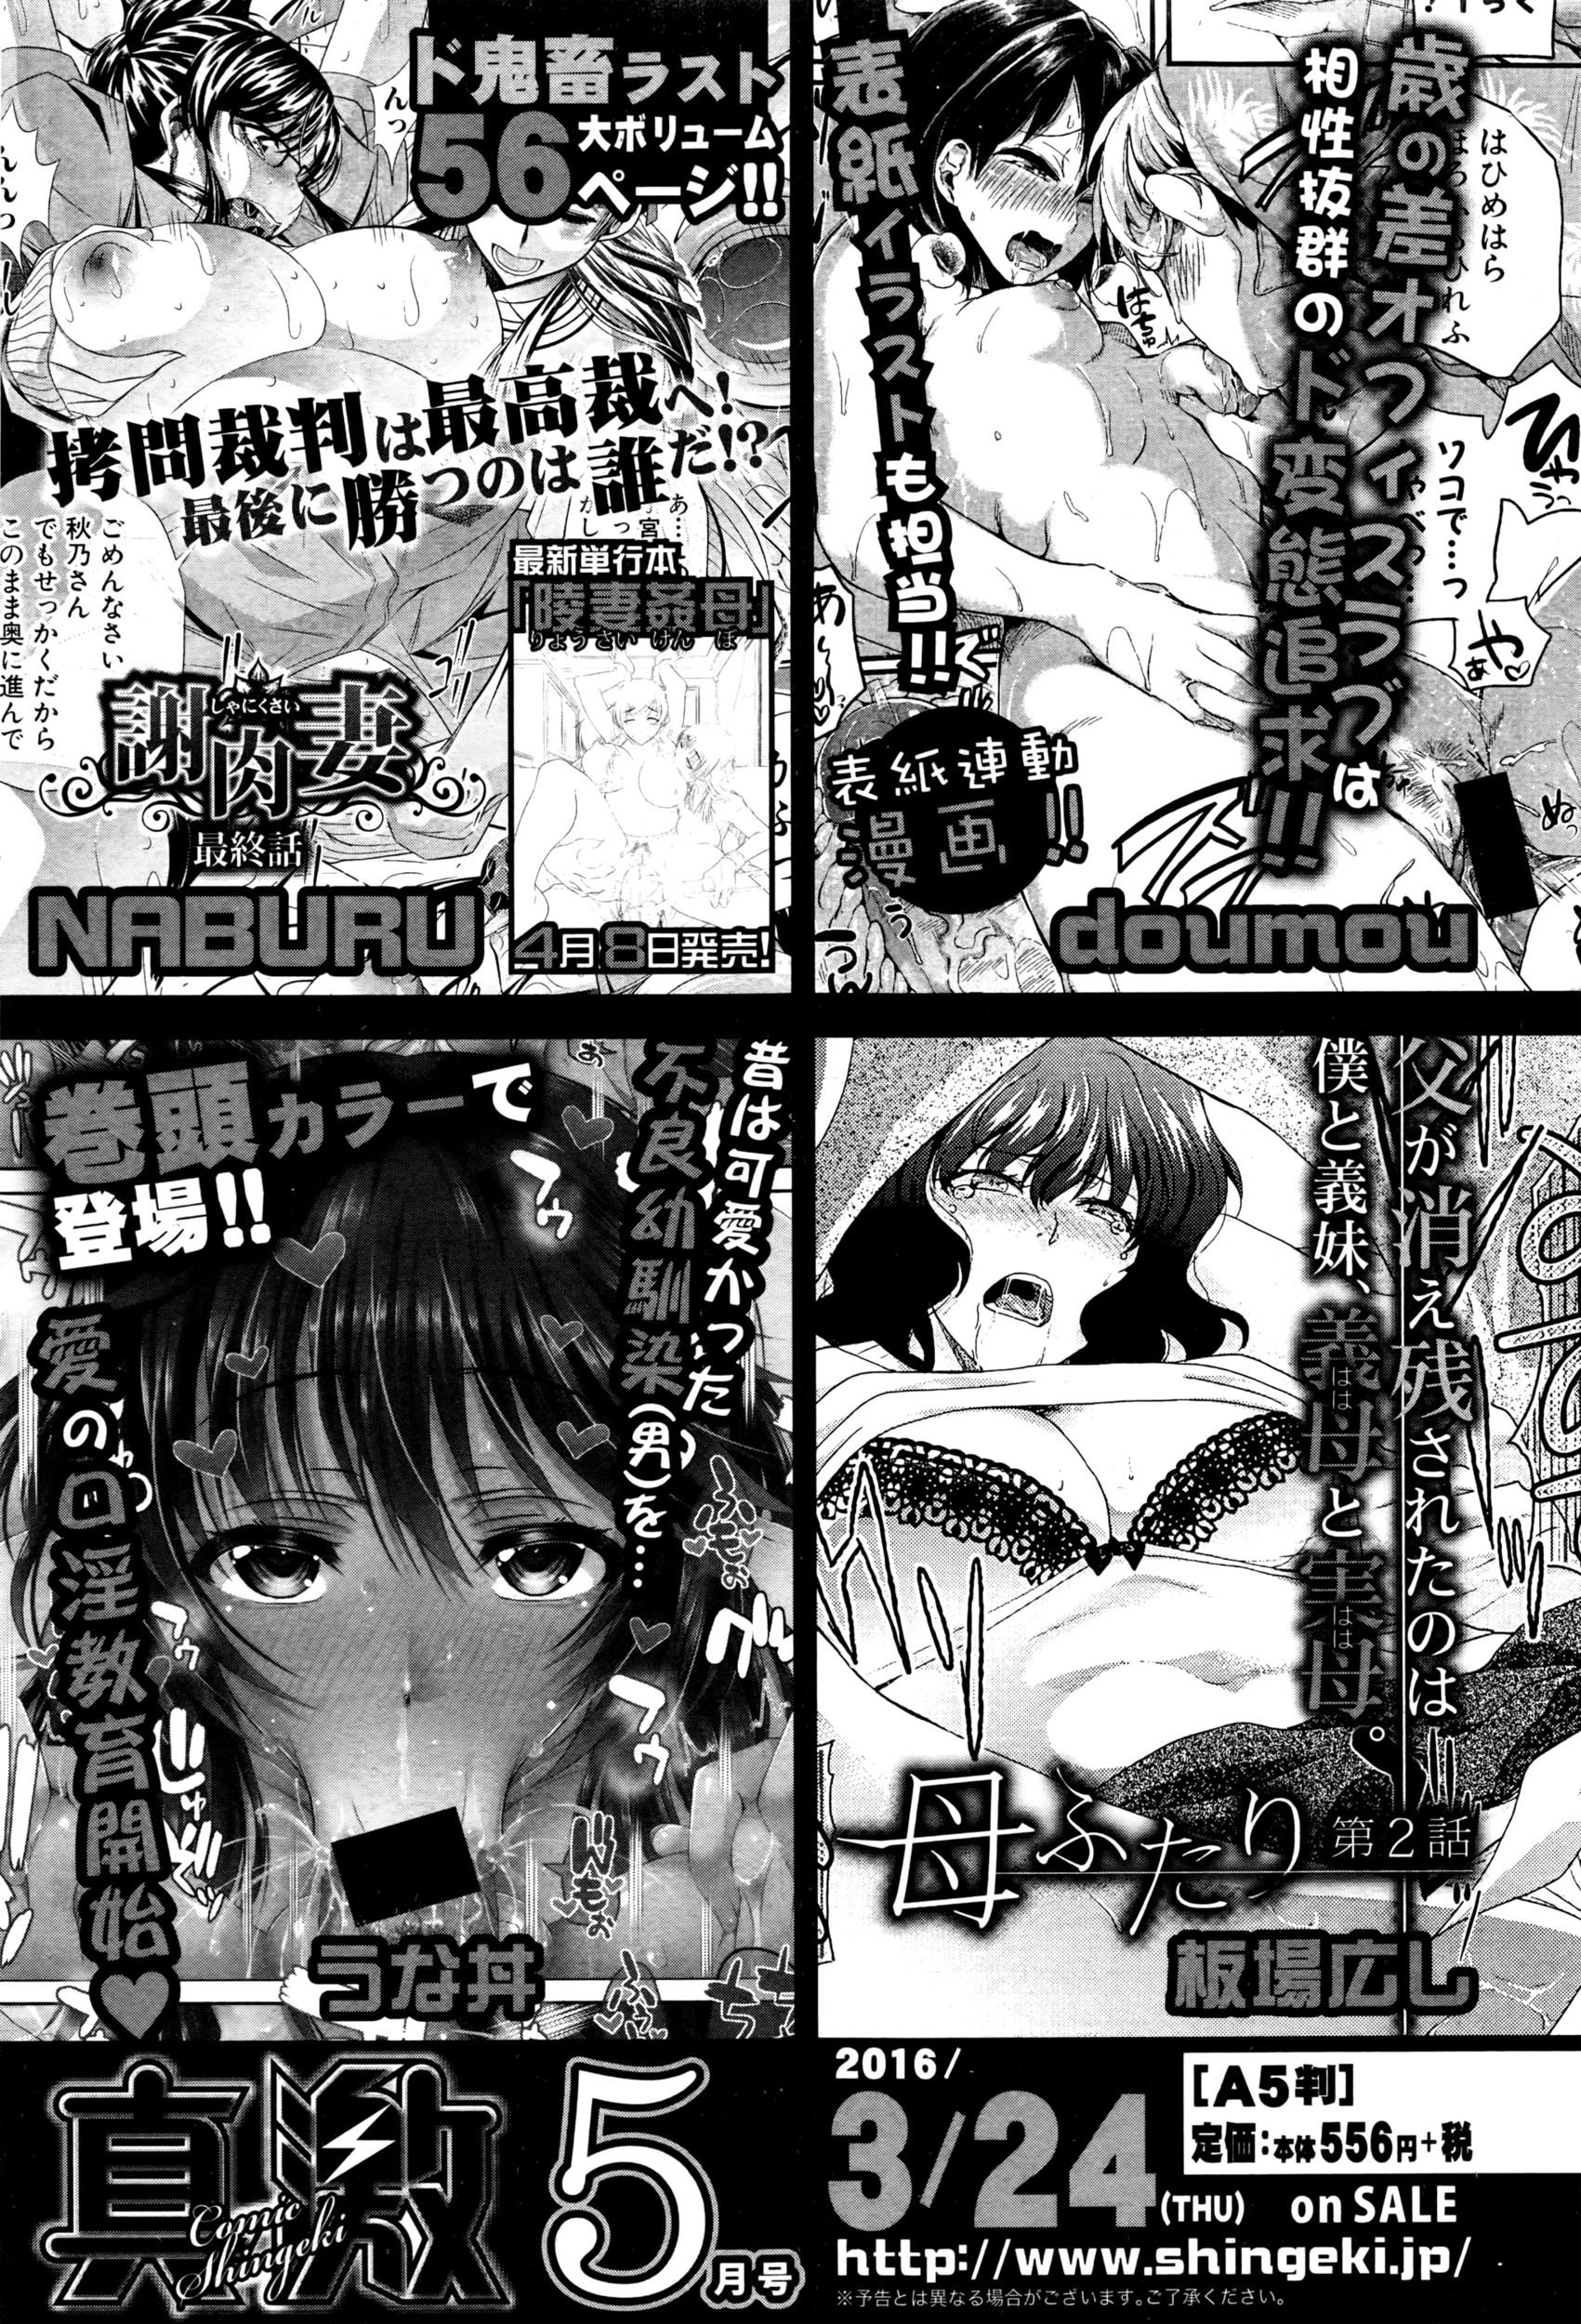 COMIC Shingeki 2016-04 361